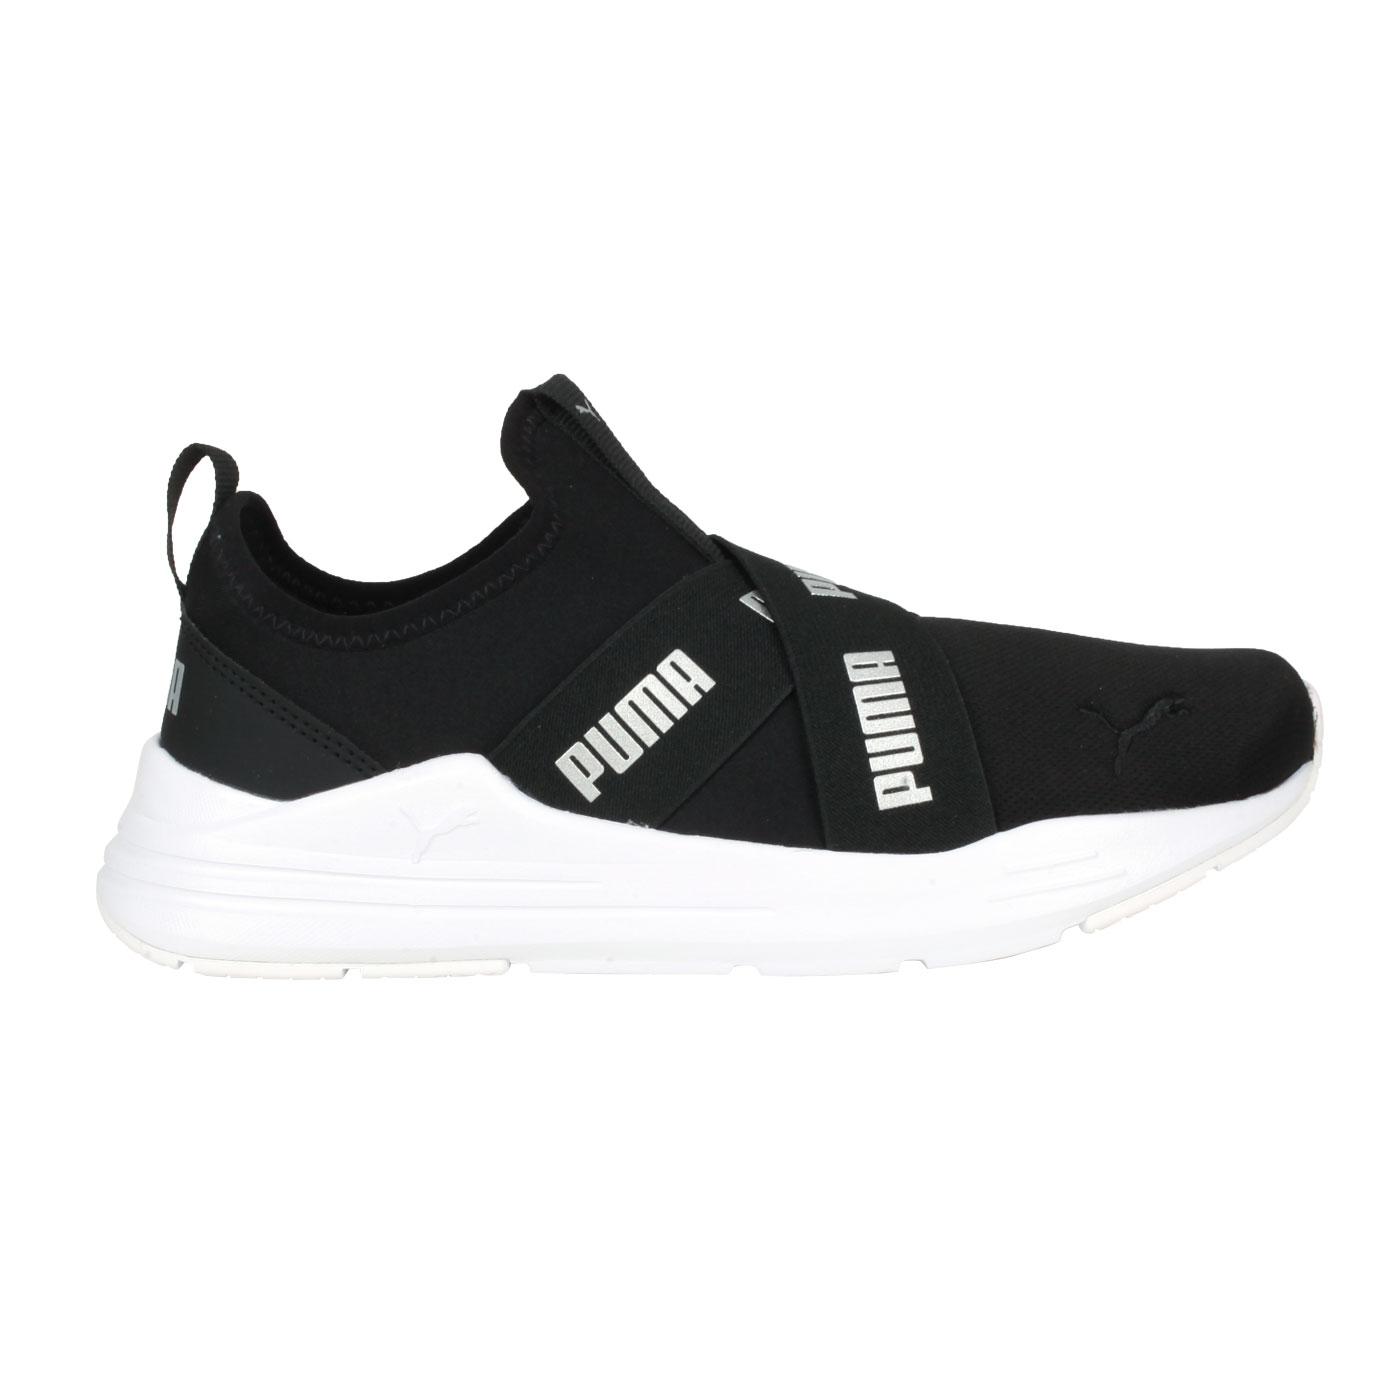 PUMA 女款休閒鞋  @Wired Run Slipon Wmns@38229901 - 黑銀